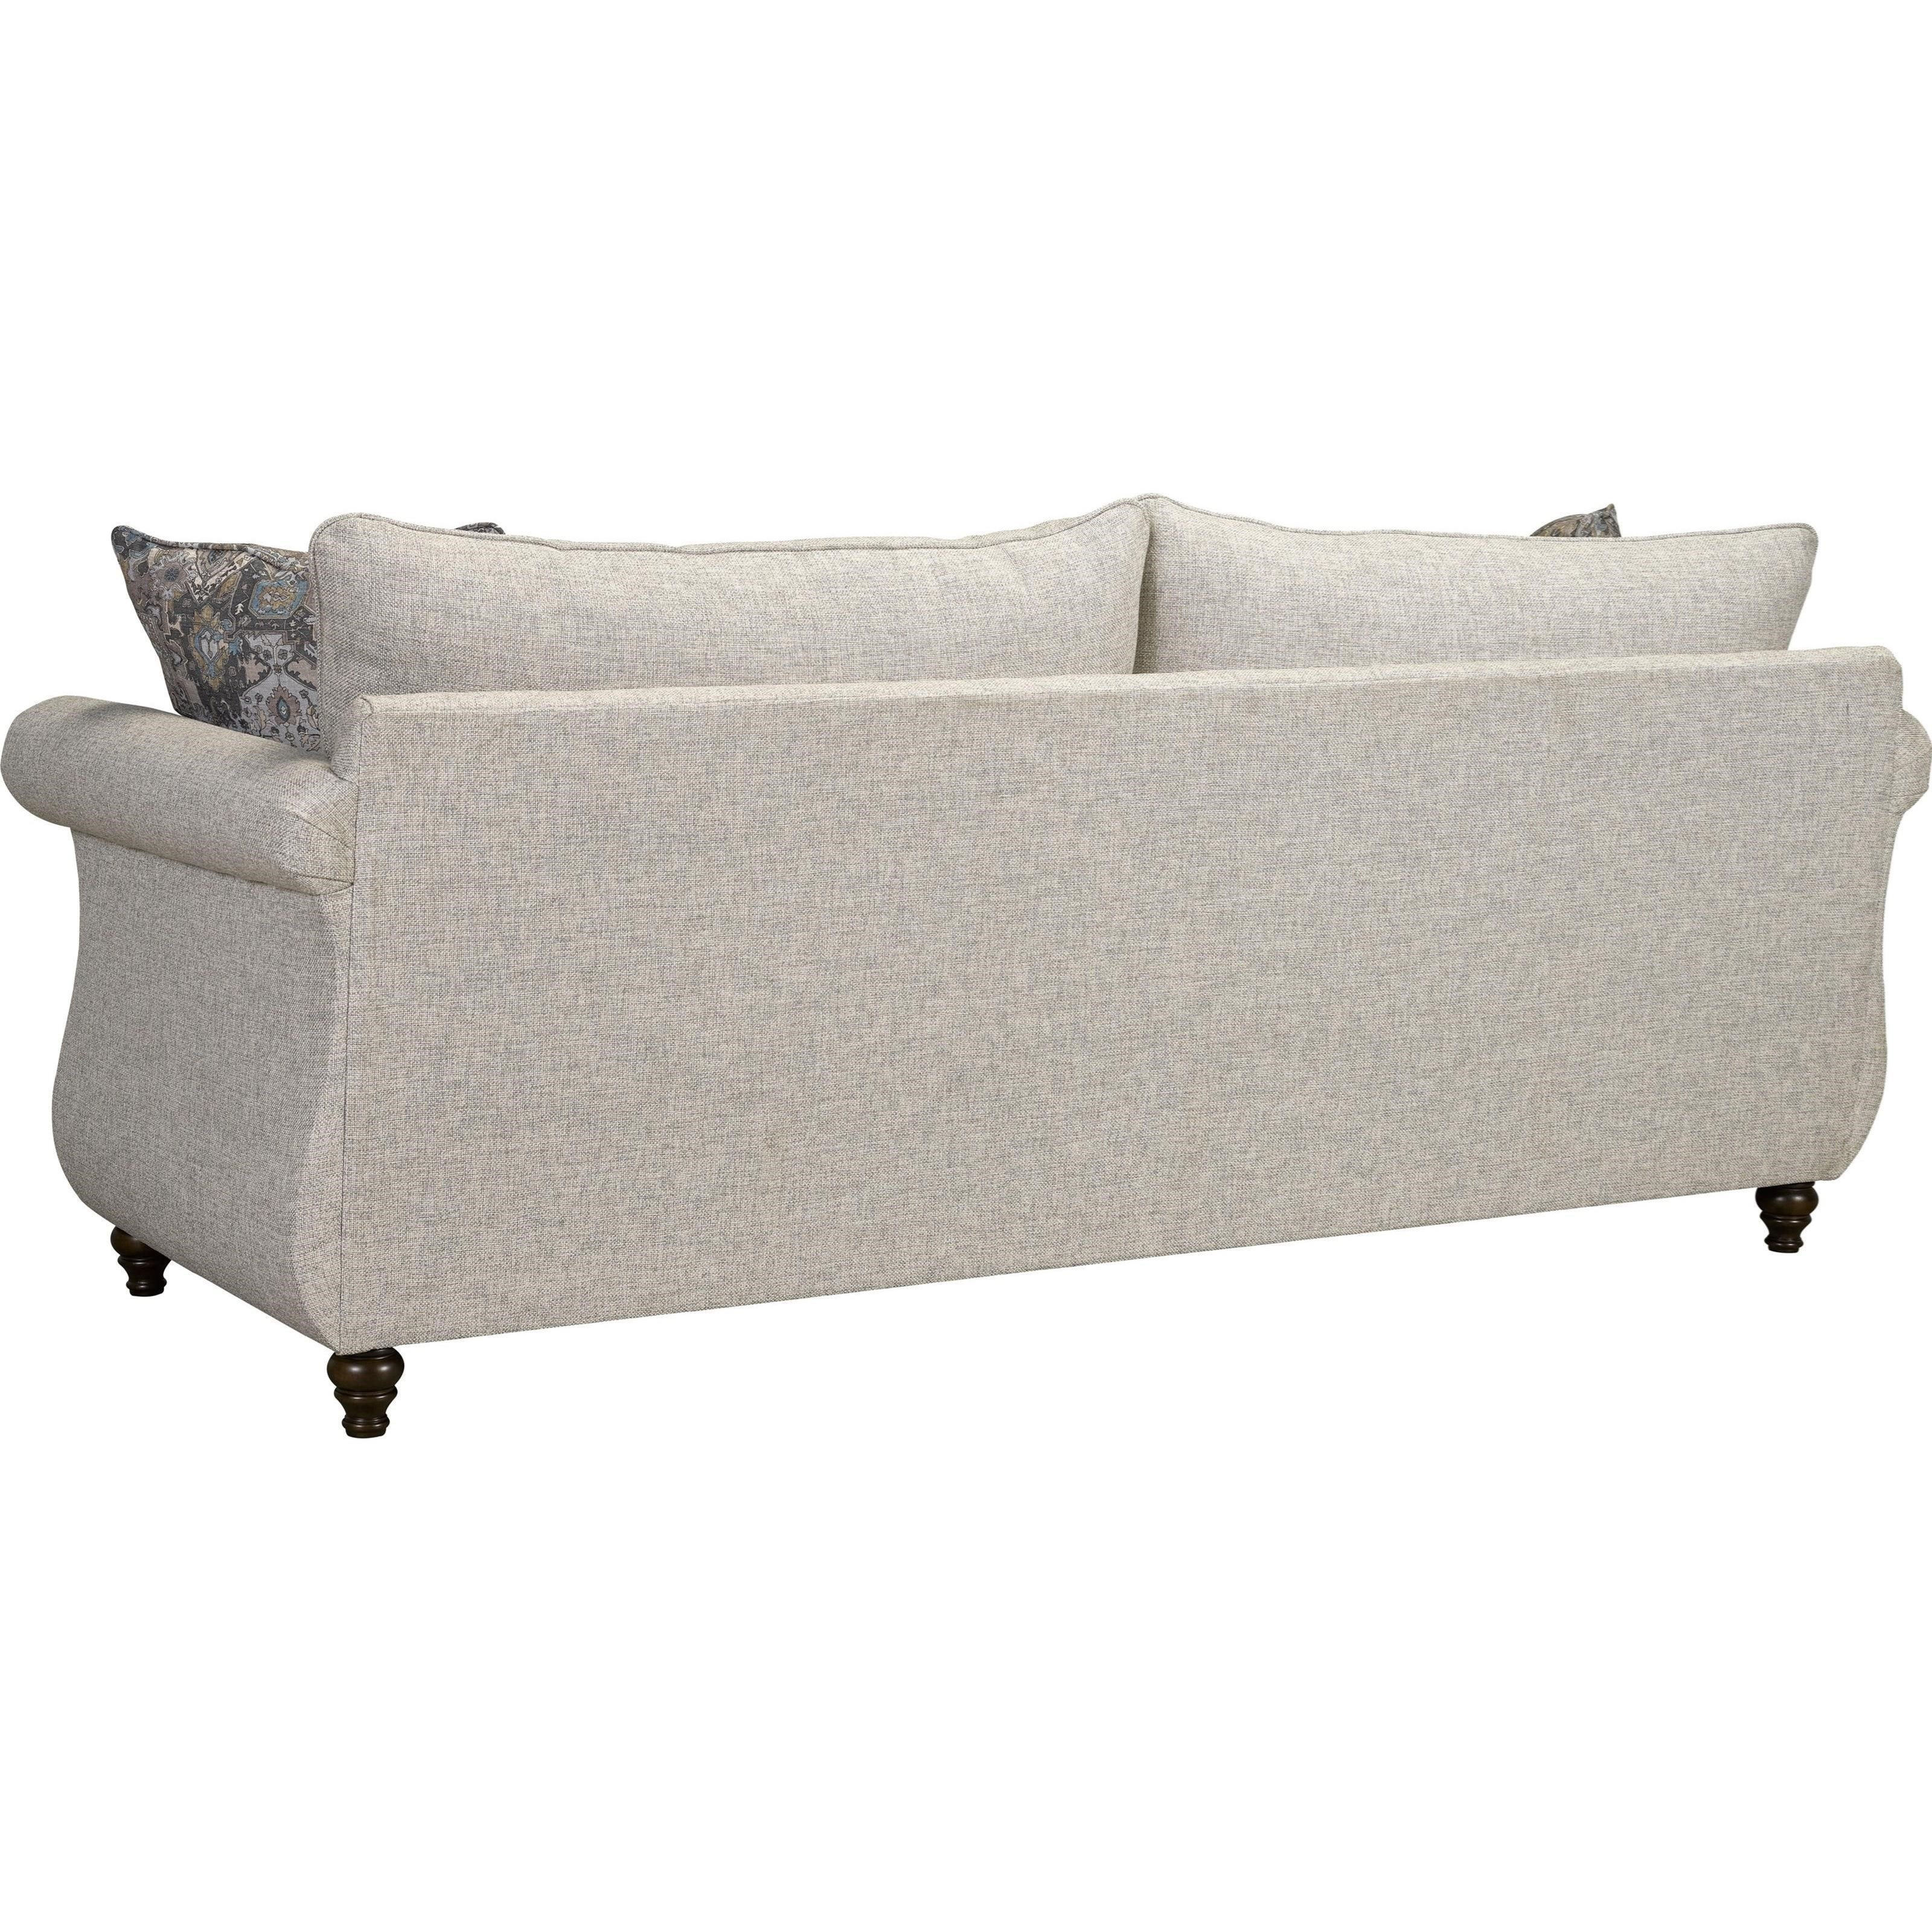 Broyhill Furniture HattieSofa; Broyhill Furniture HattieSofa; Broyhill  Furniture HattieSofa